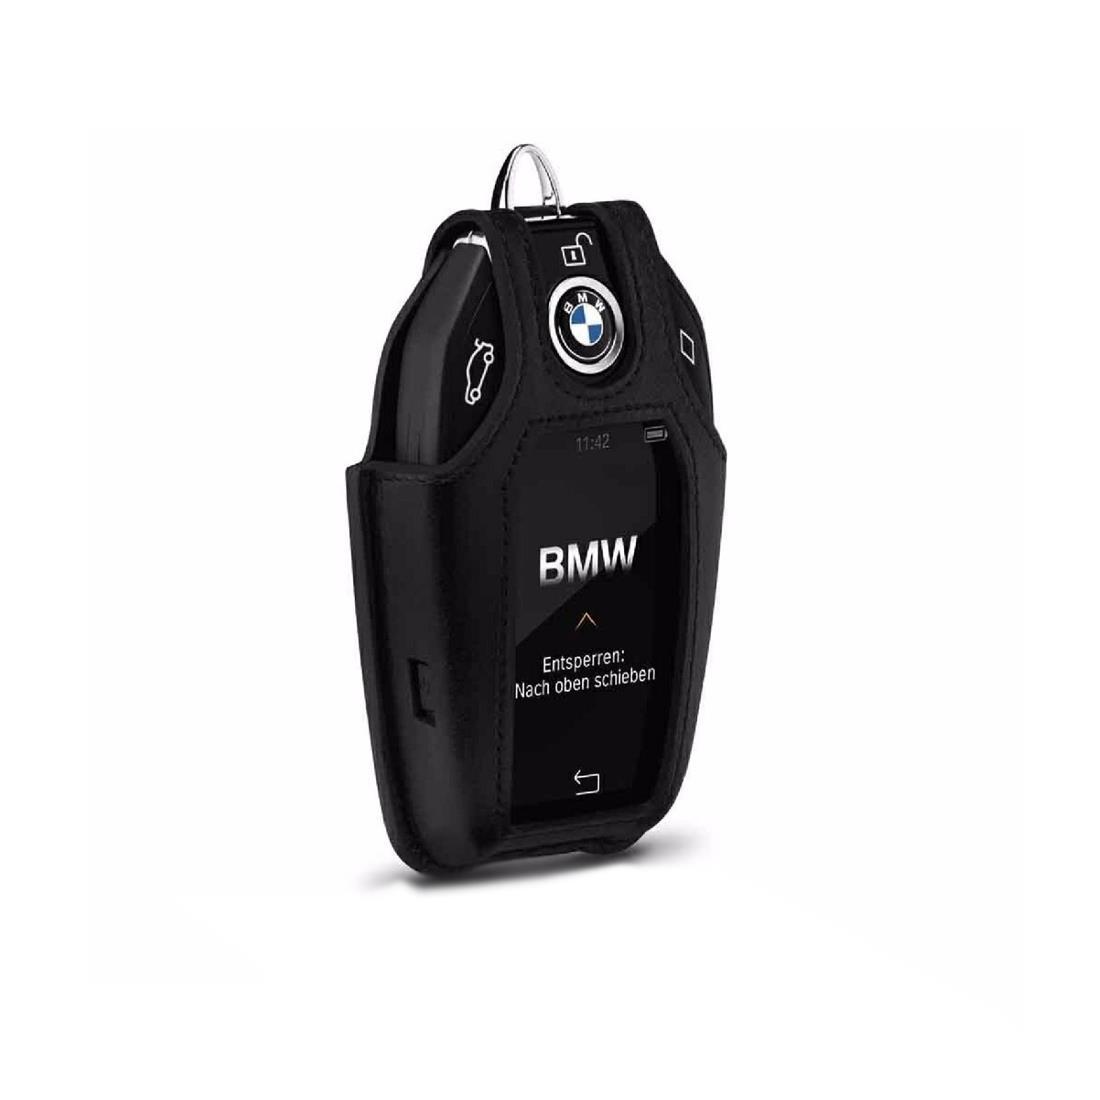 MONTBLANC for BMW Car Key Sleeve